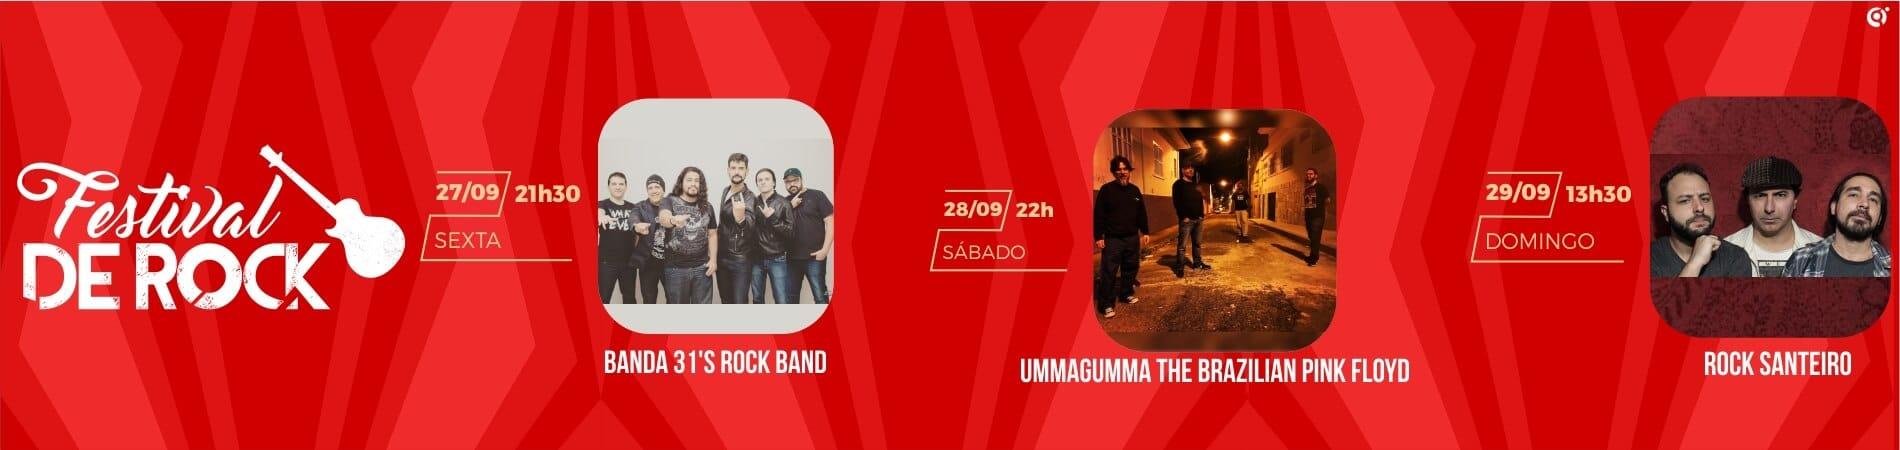 Festival do Rock